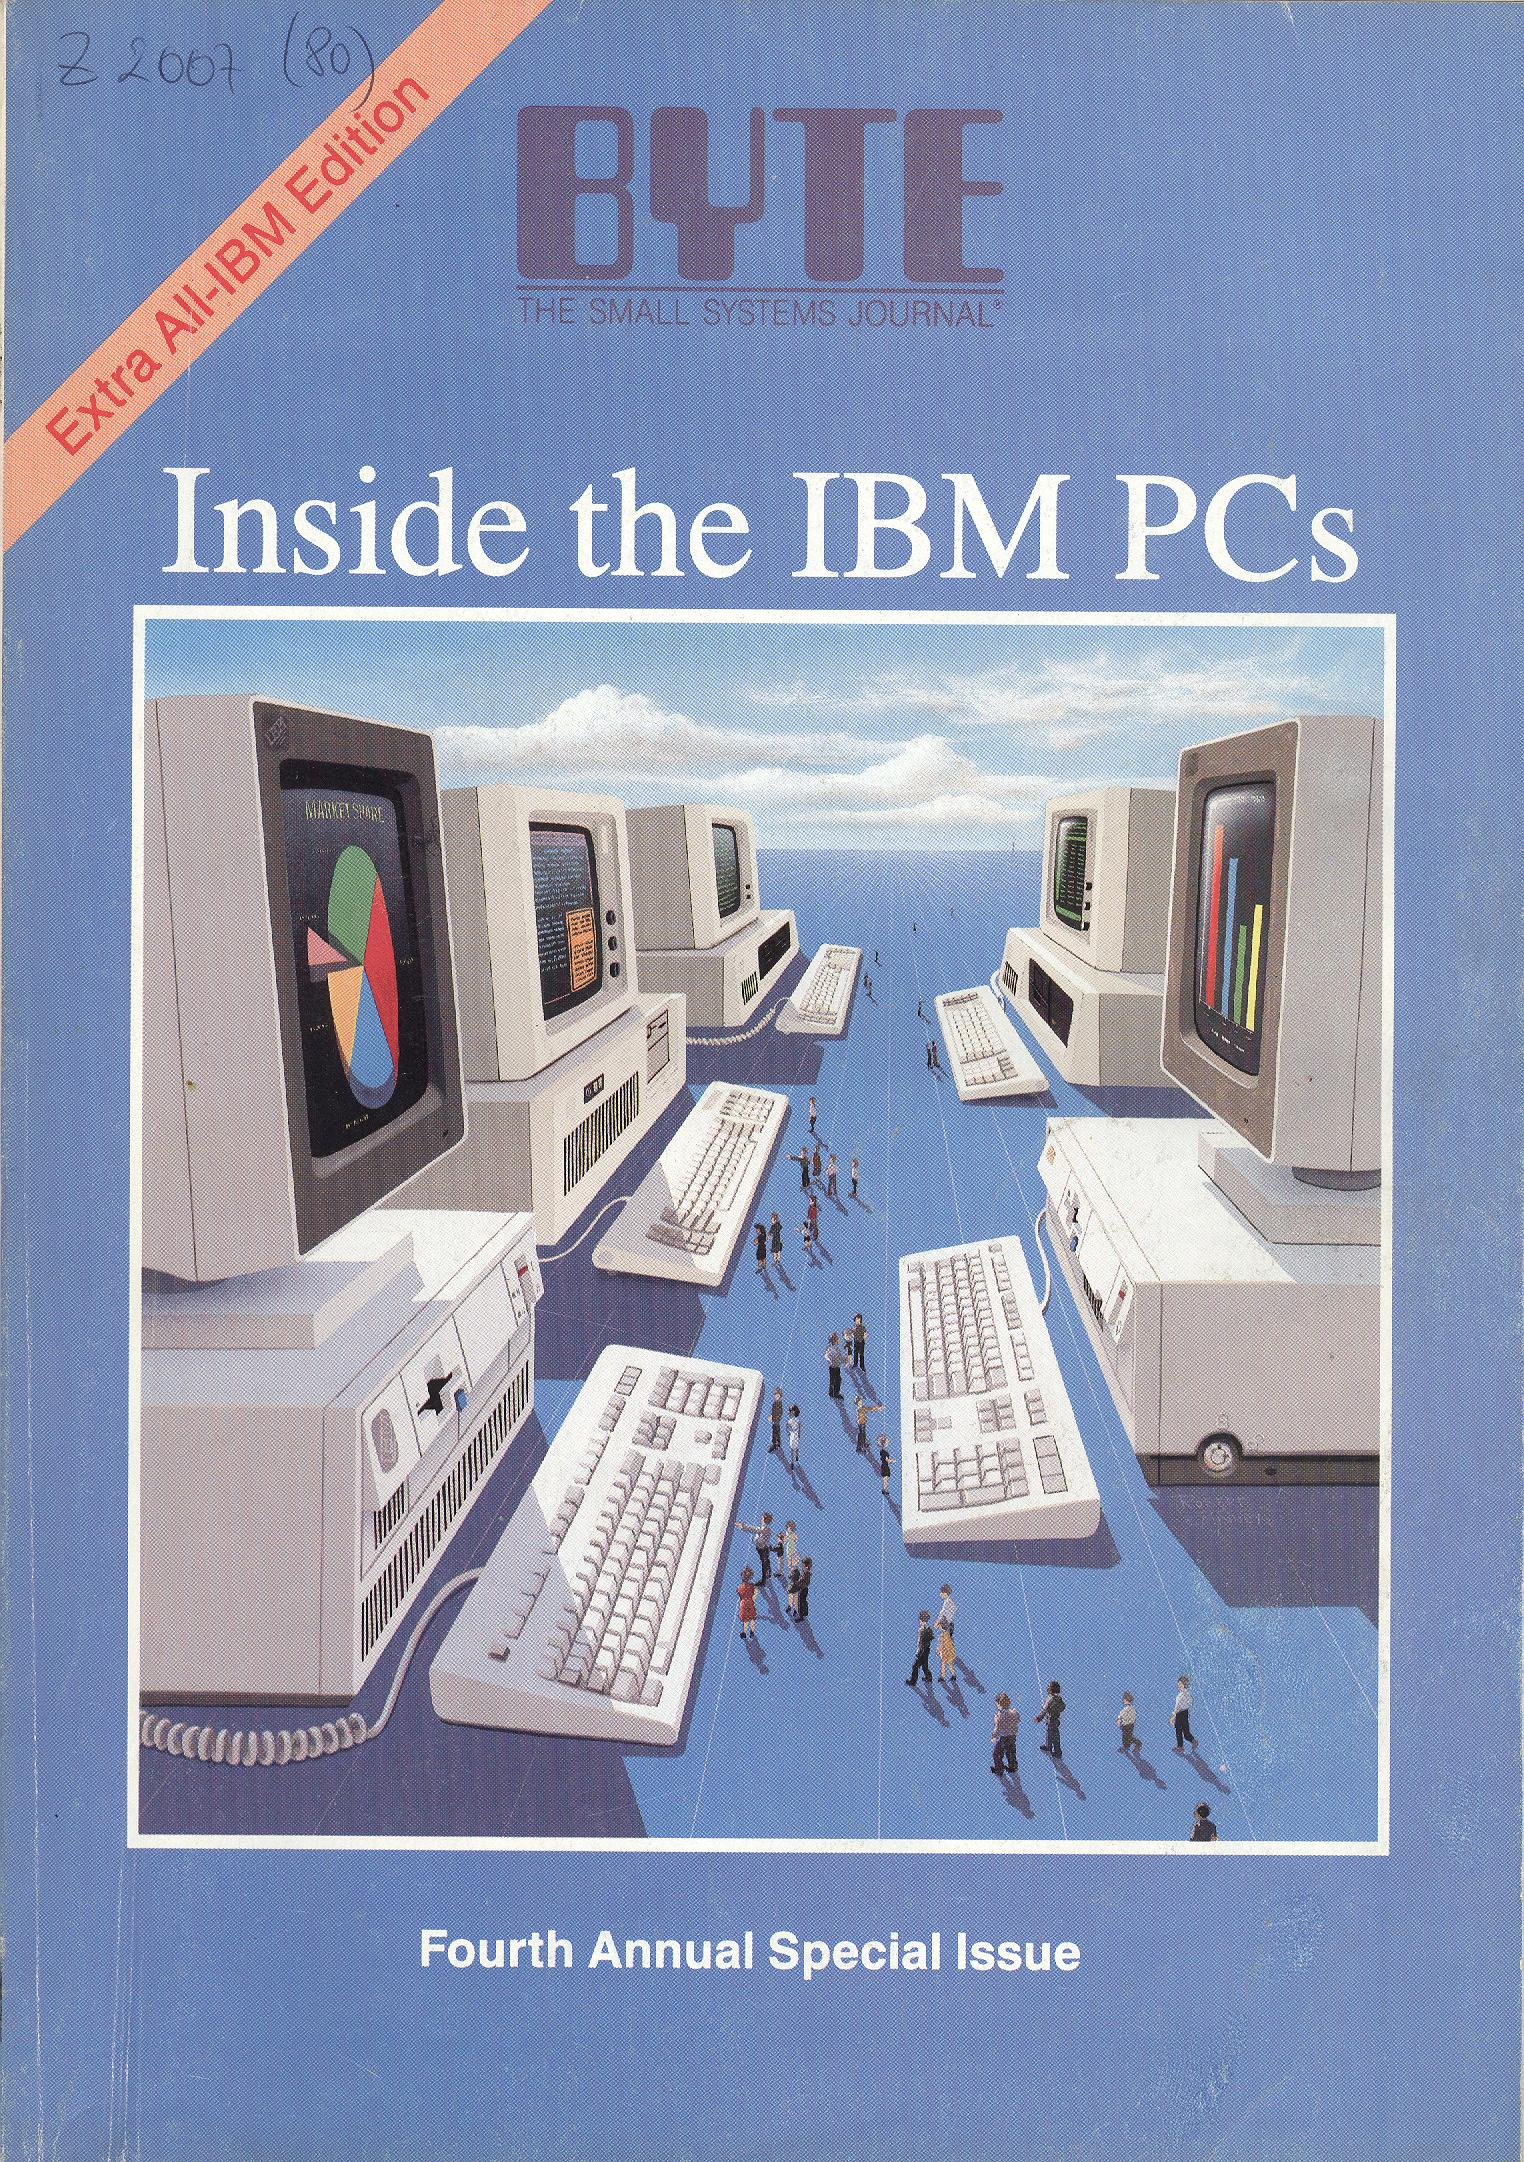 Inside the IBM PCs